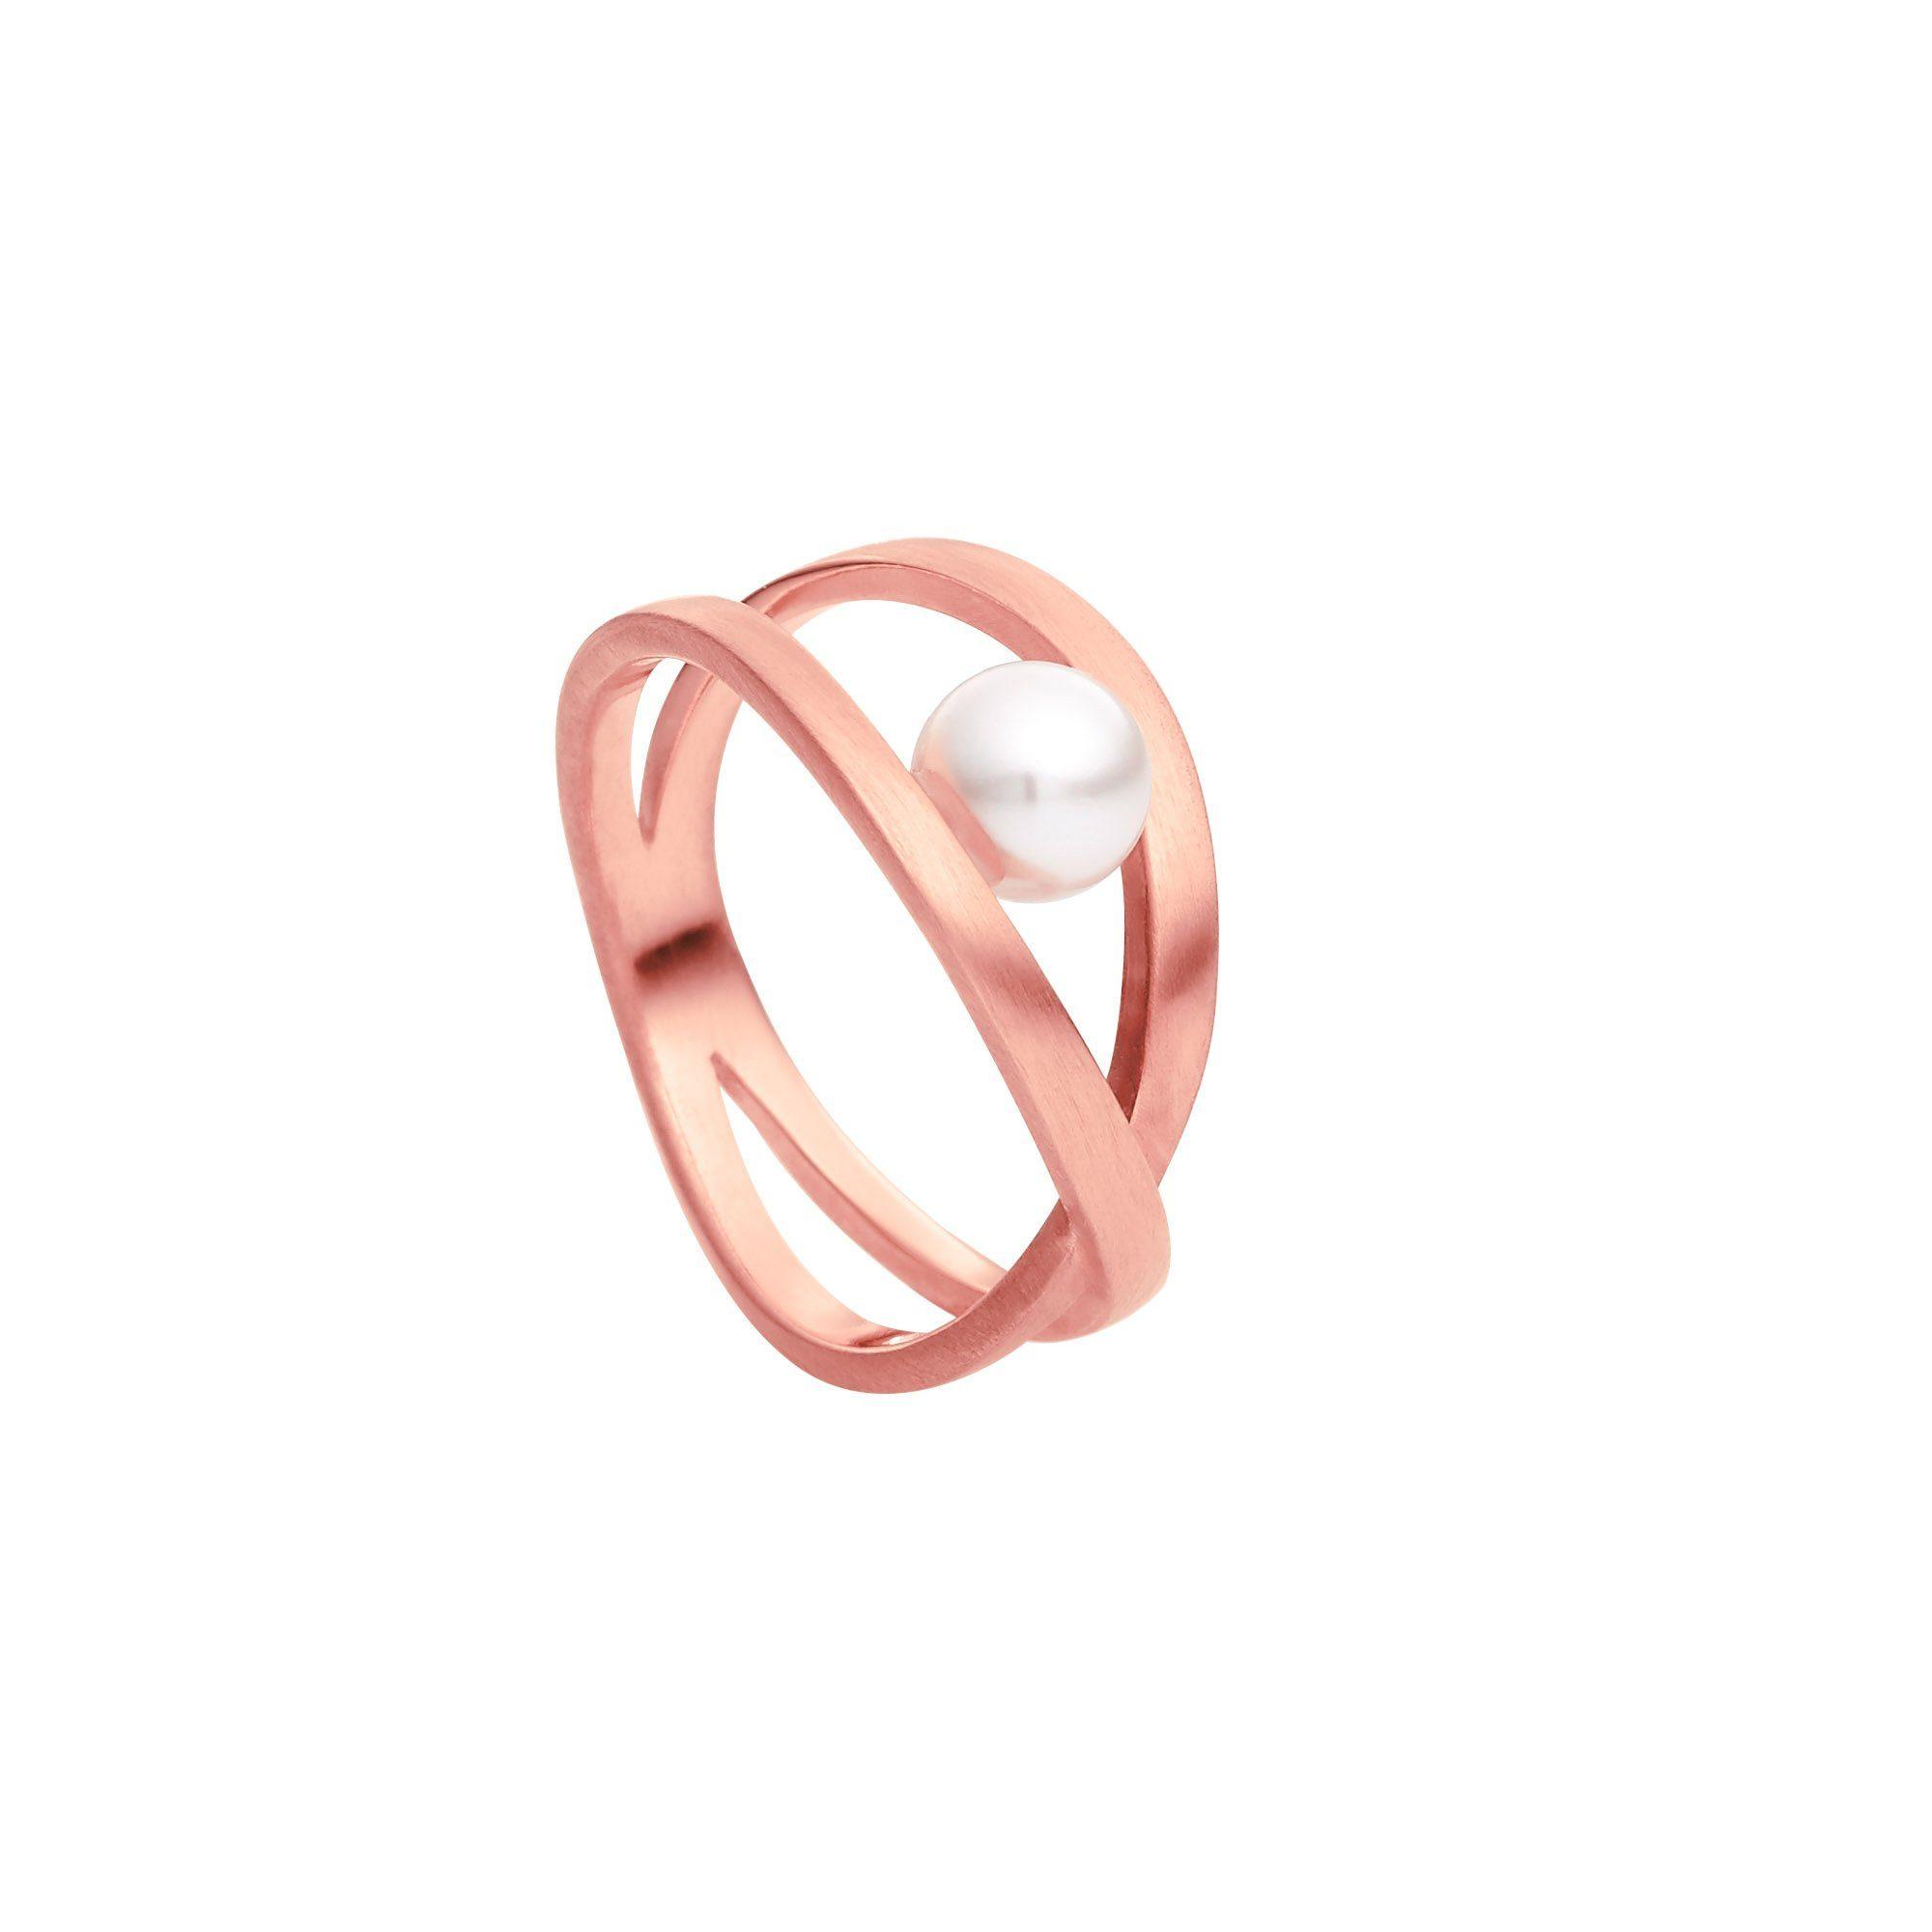 Heideman Perlenring »Facilis Rosevergoldet« Damenring mit Swarovski Perle